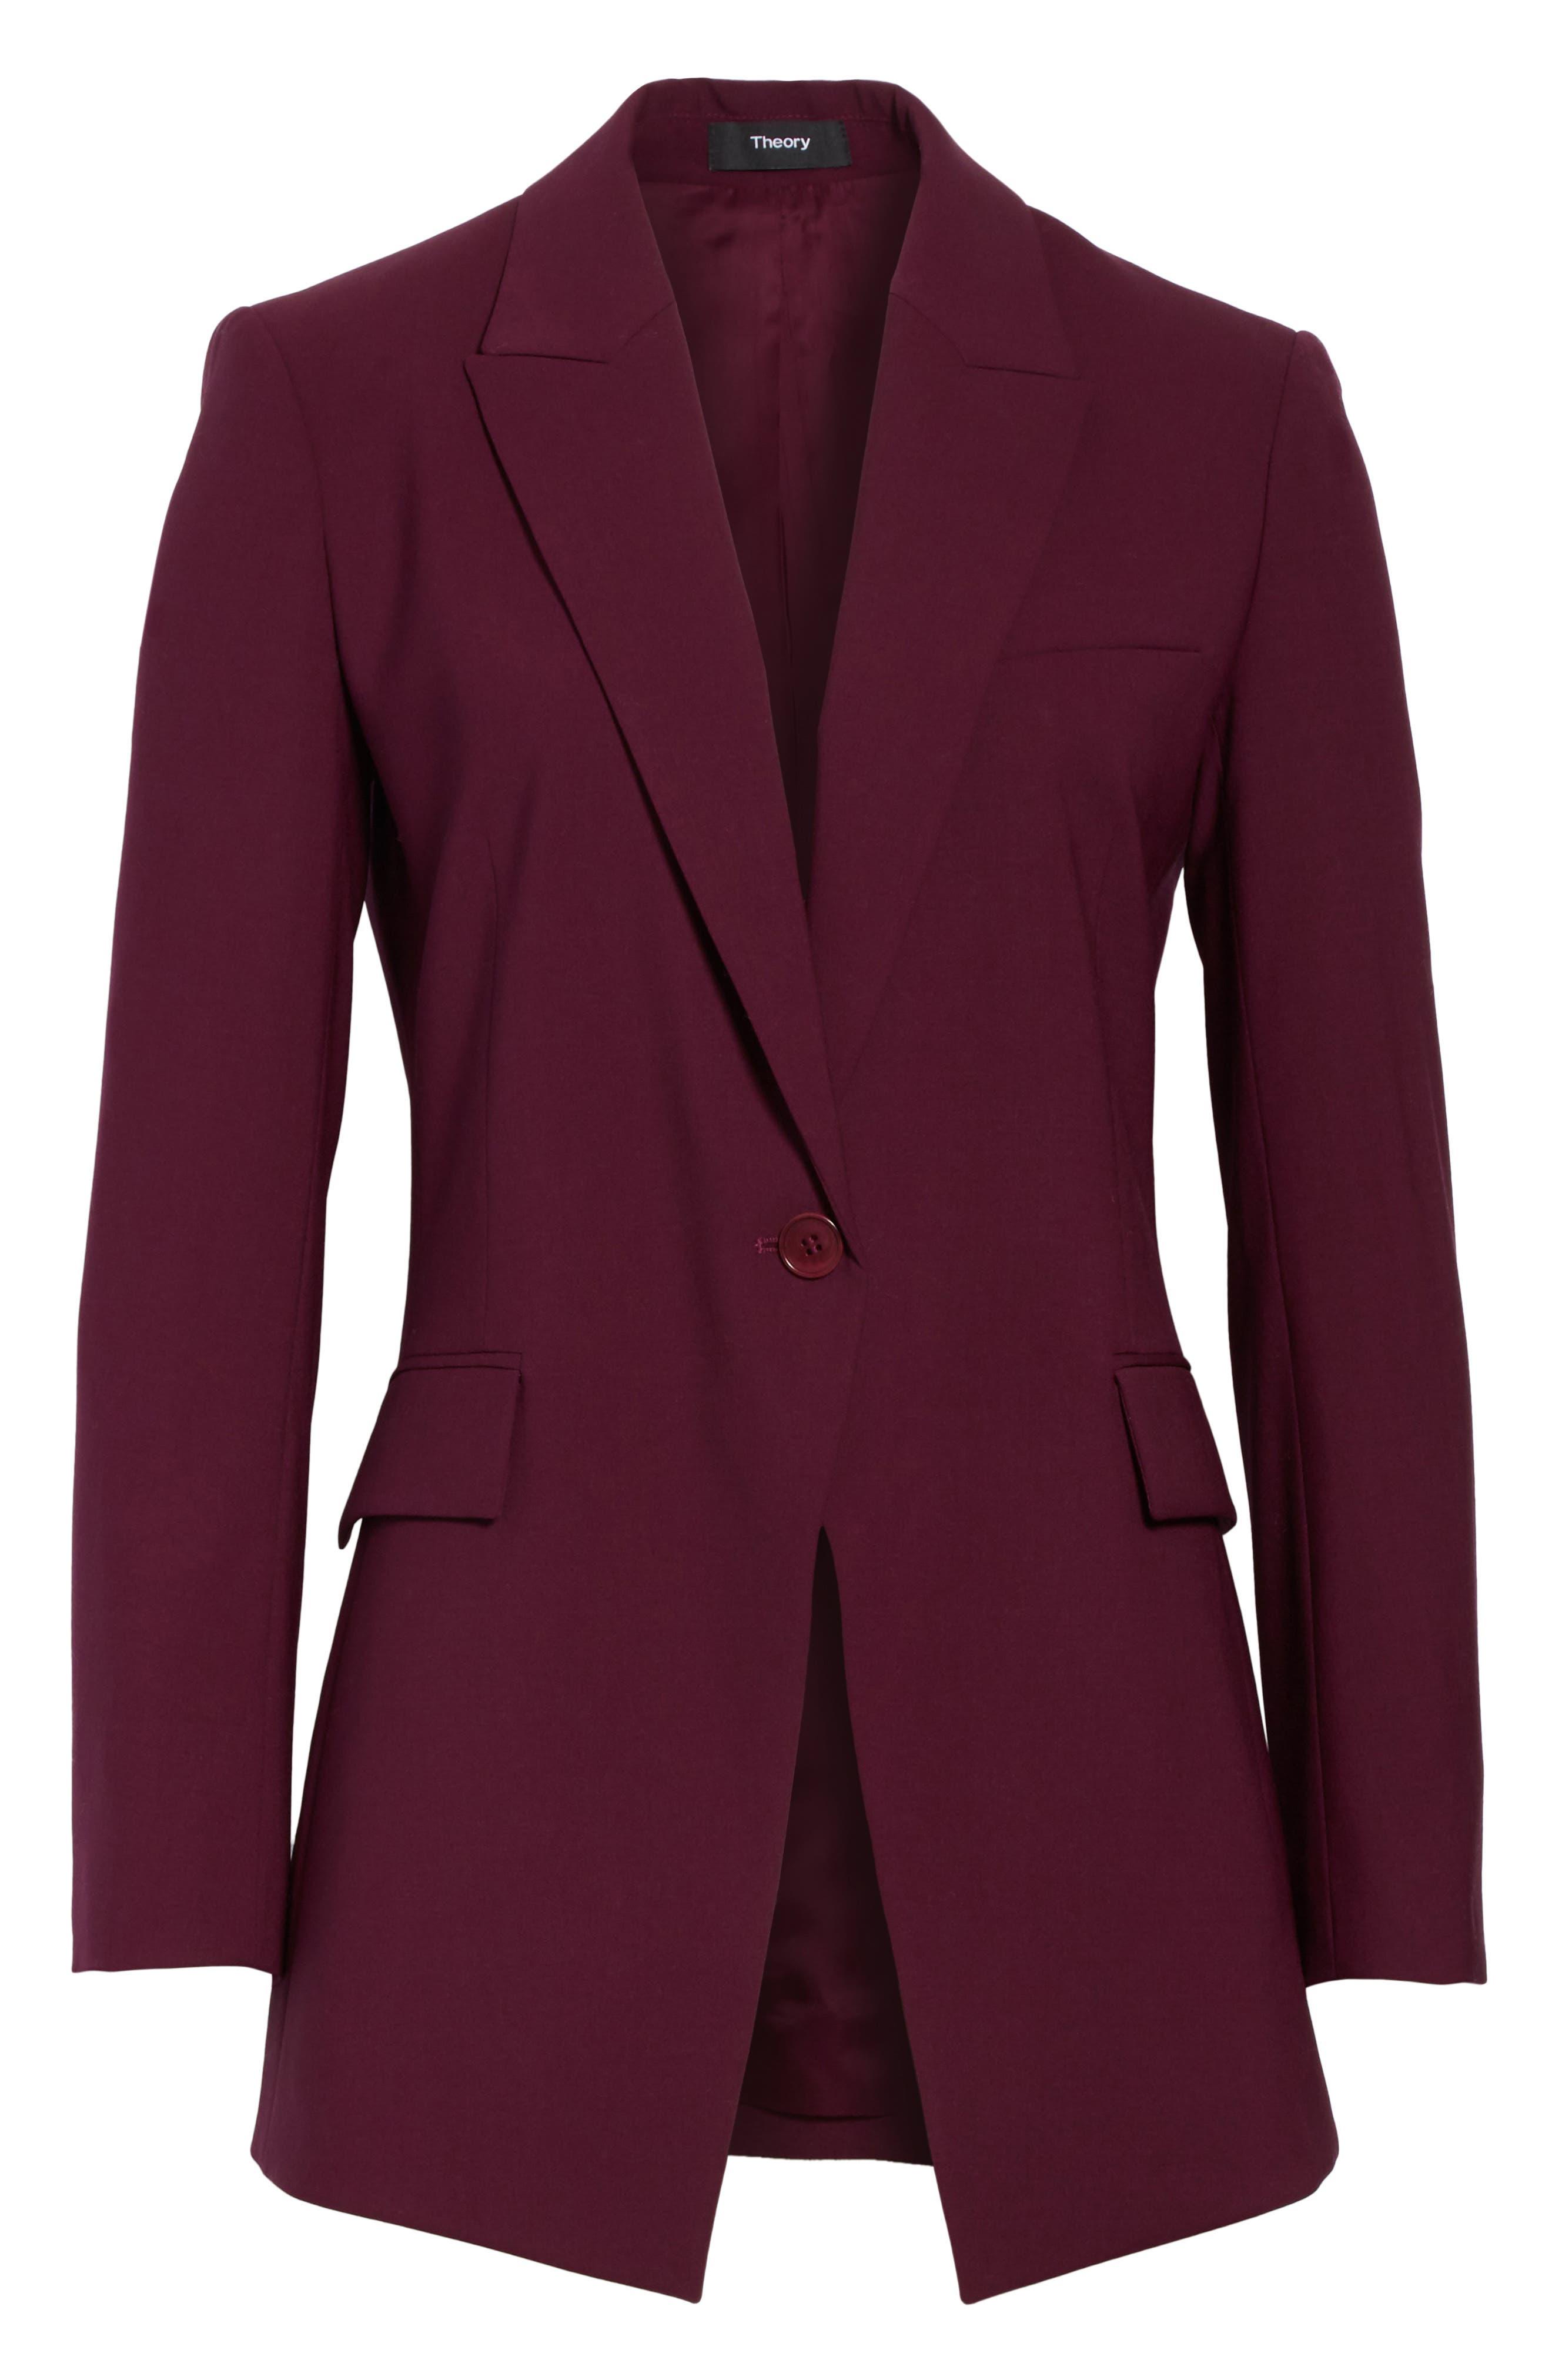 Etienette B Good Wool Suit Jacket,                             Alternate thumbnail 37, color,